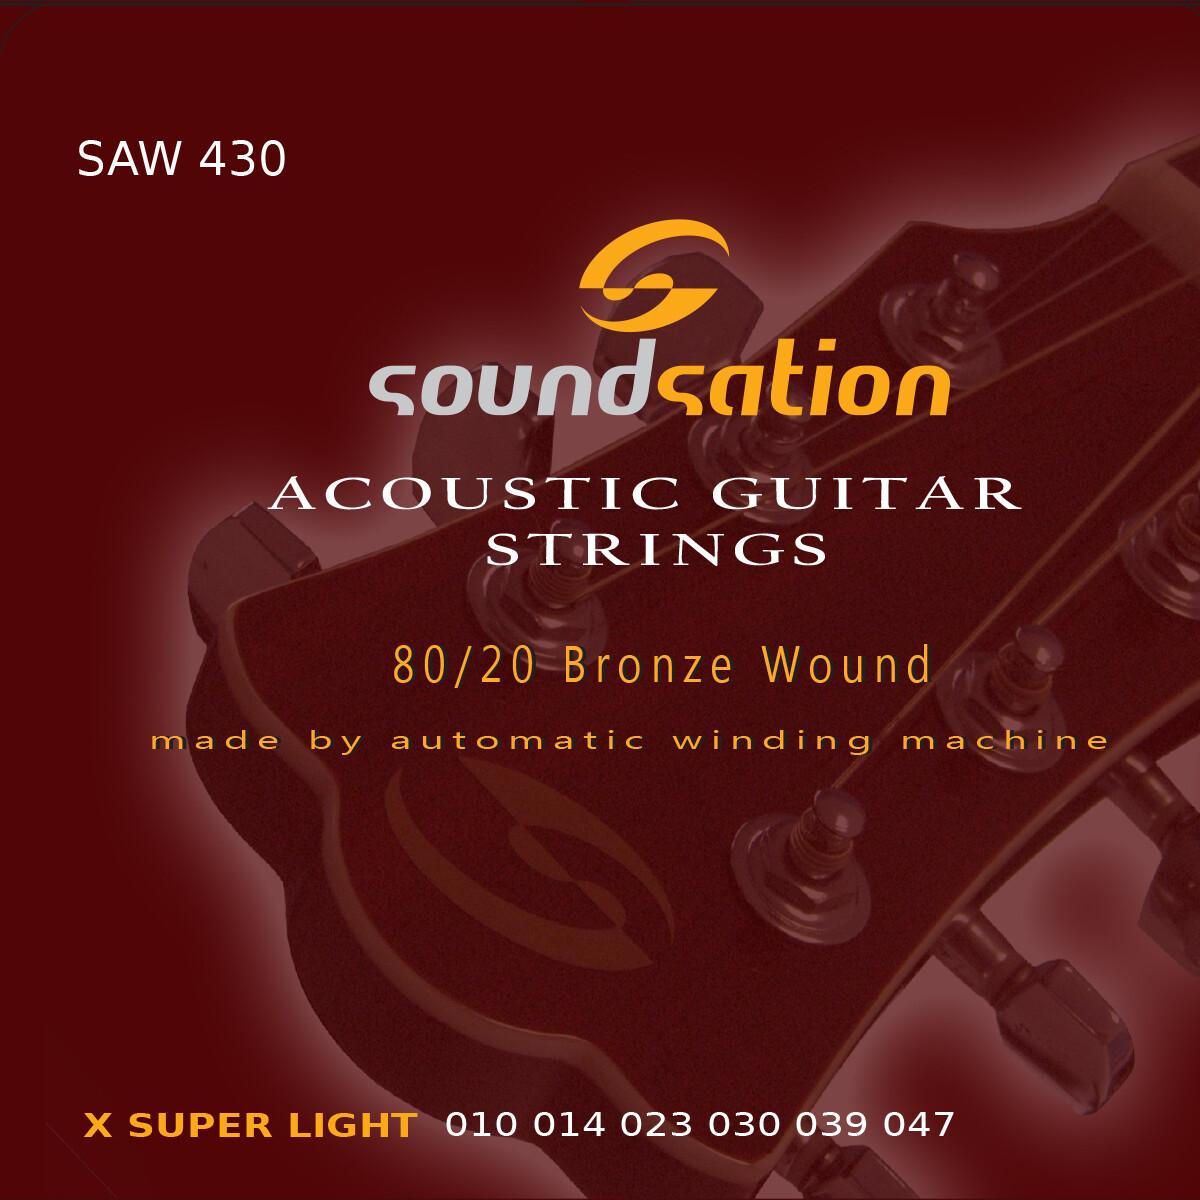 Acoustic Guitar String  X super light SAW430